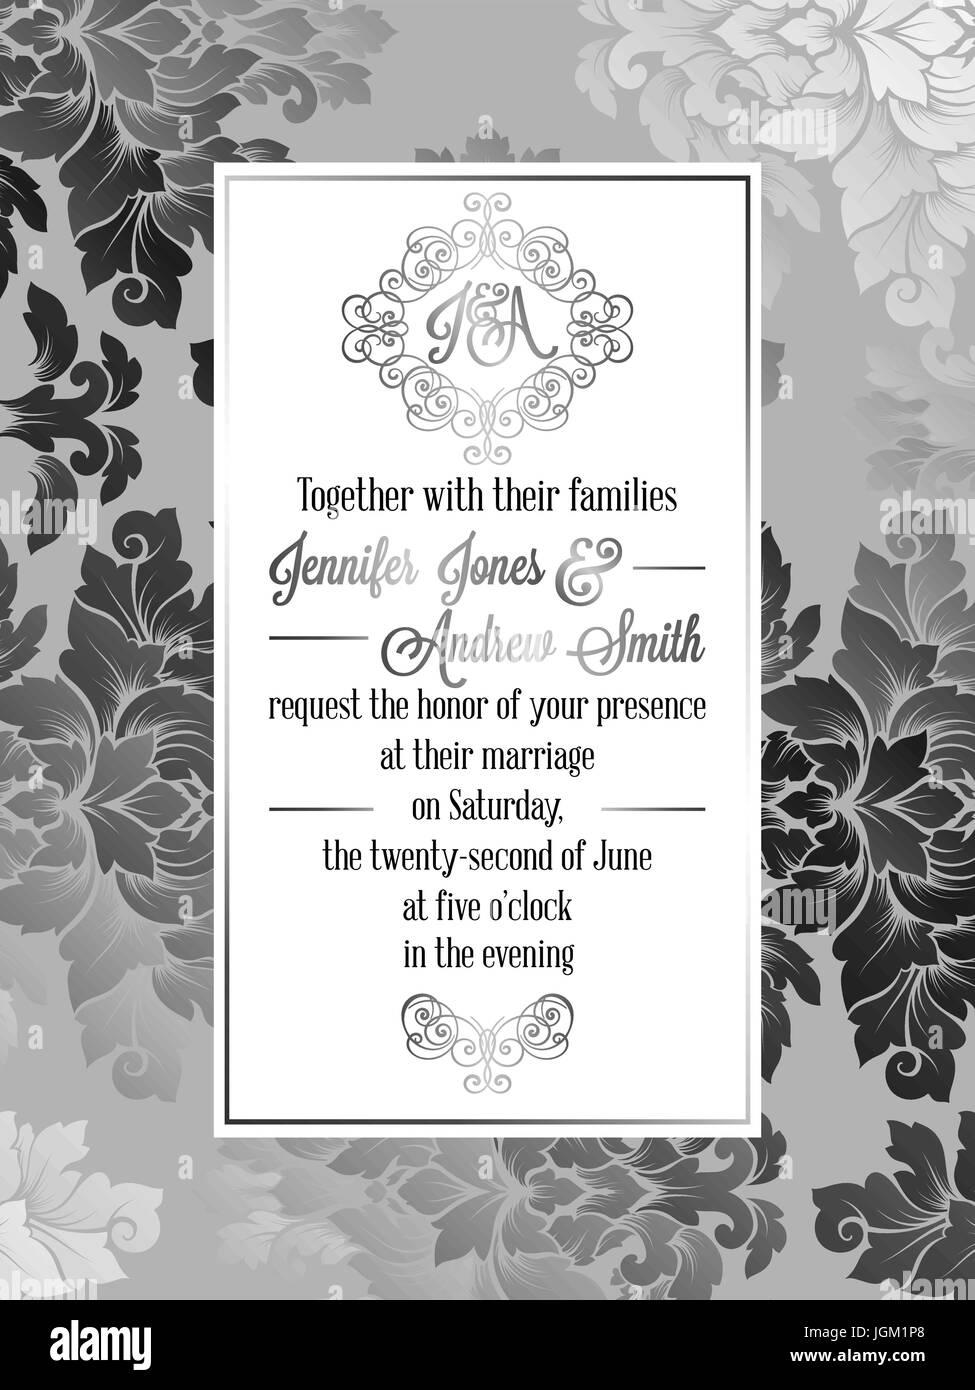 Vintage baroque style wedding invitation card template elegant vintage baroque style wedding invitation card template elegant formal design with damask background traditional decoration for wedding silver dec stopboris Gallery